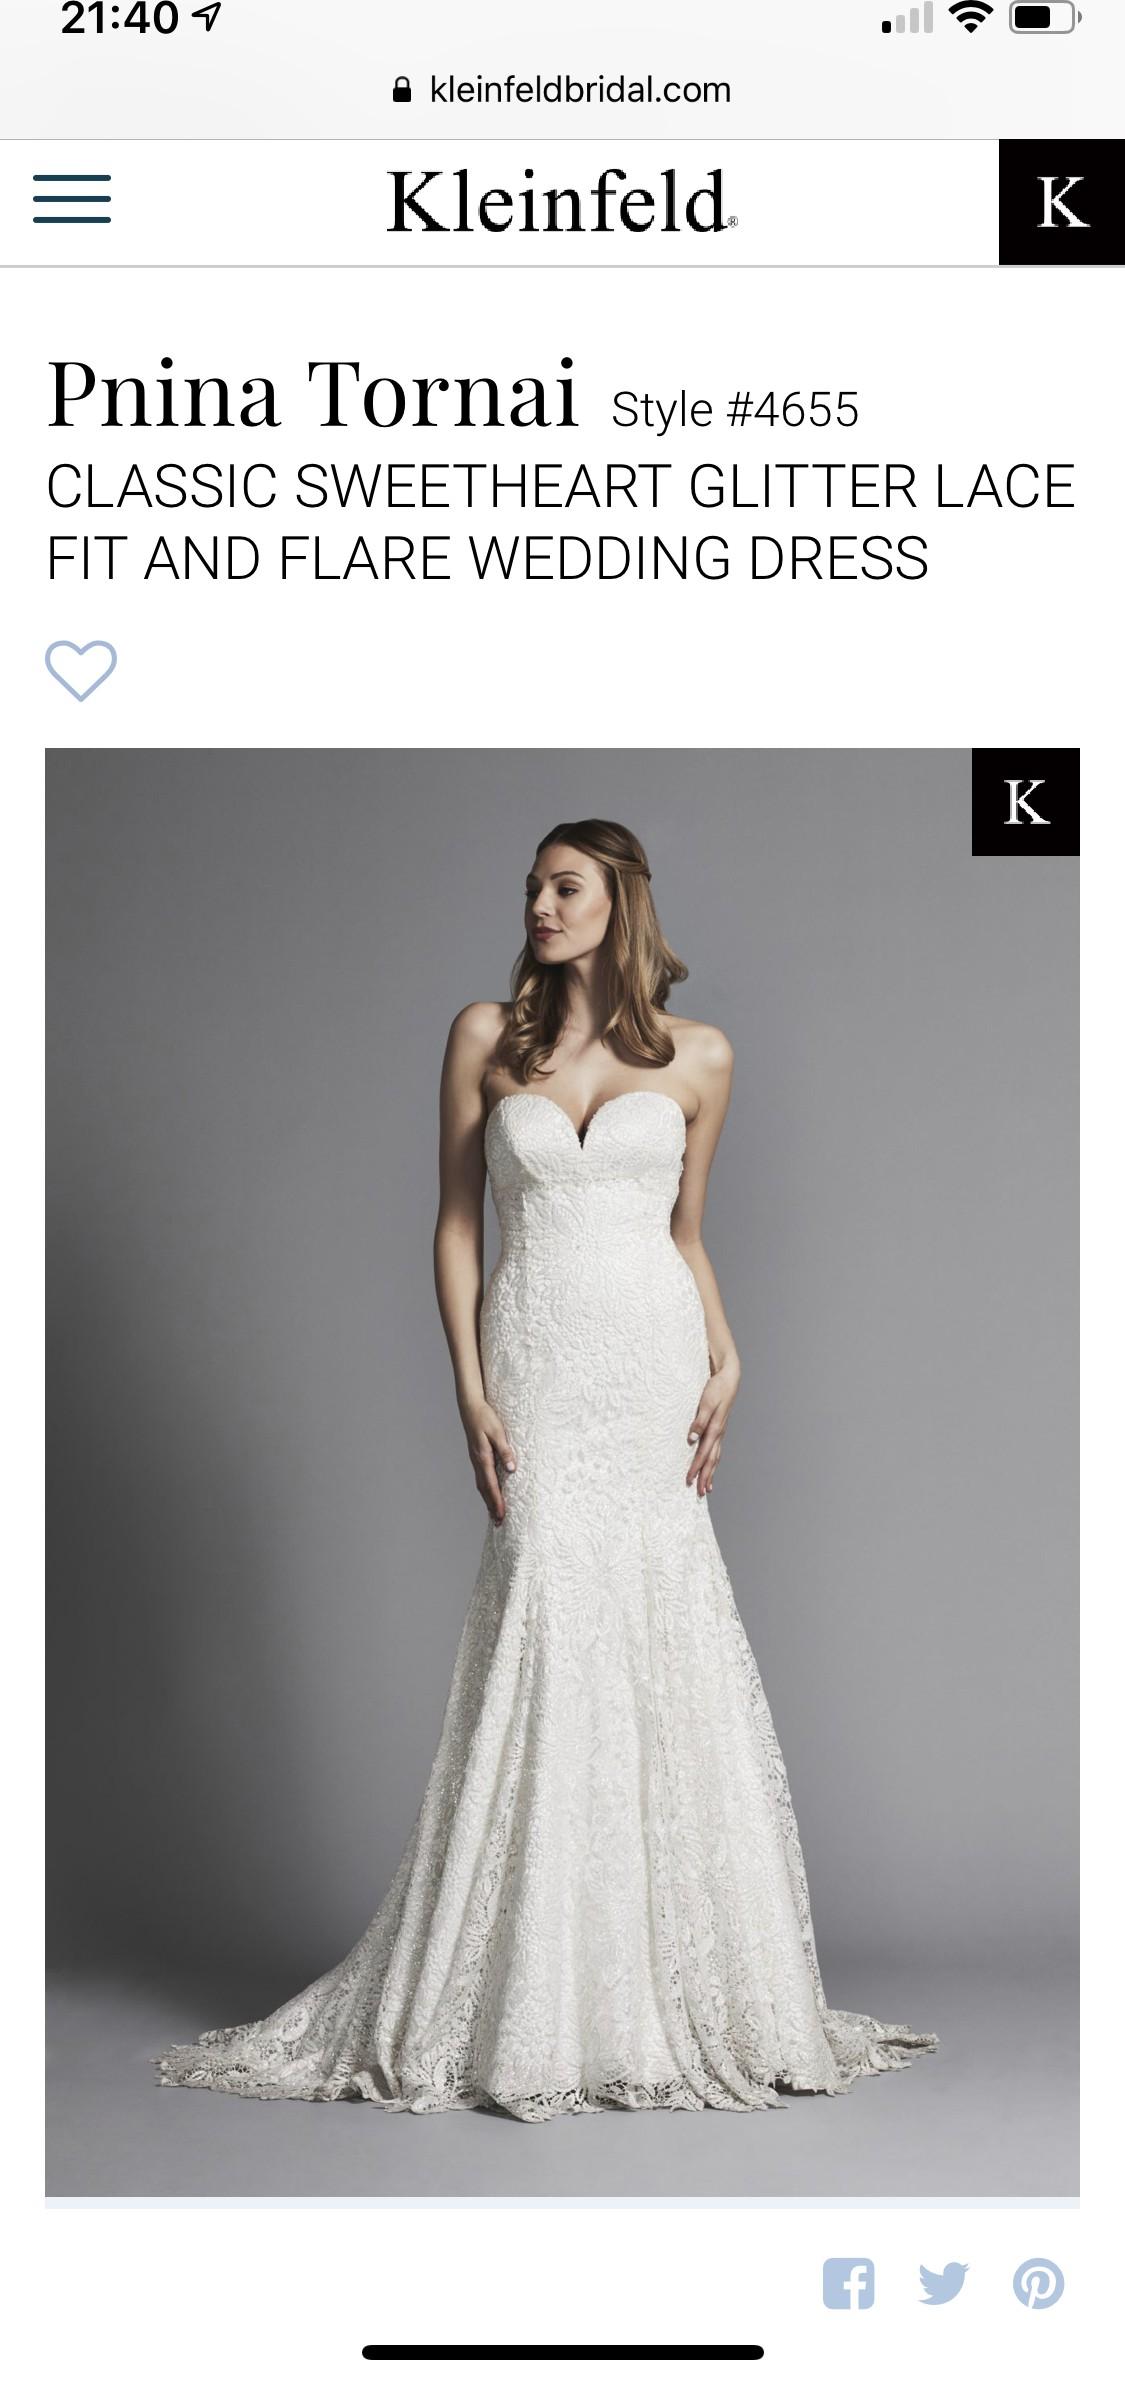 db729f30631 Pnina Tornai Off White Lace 5179 - 4655 Feminine Wedding Dress Second Hand  Wedding Dress on Sale 50% Off - Stillwhite United Kingdom